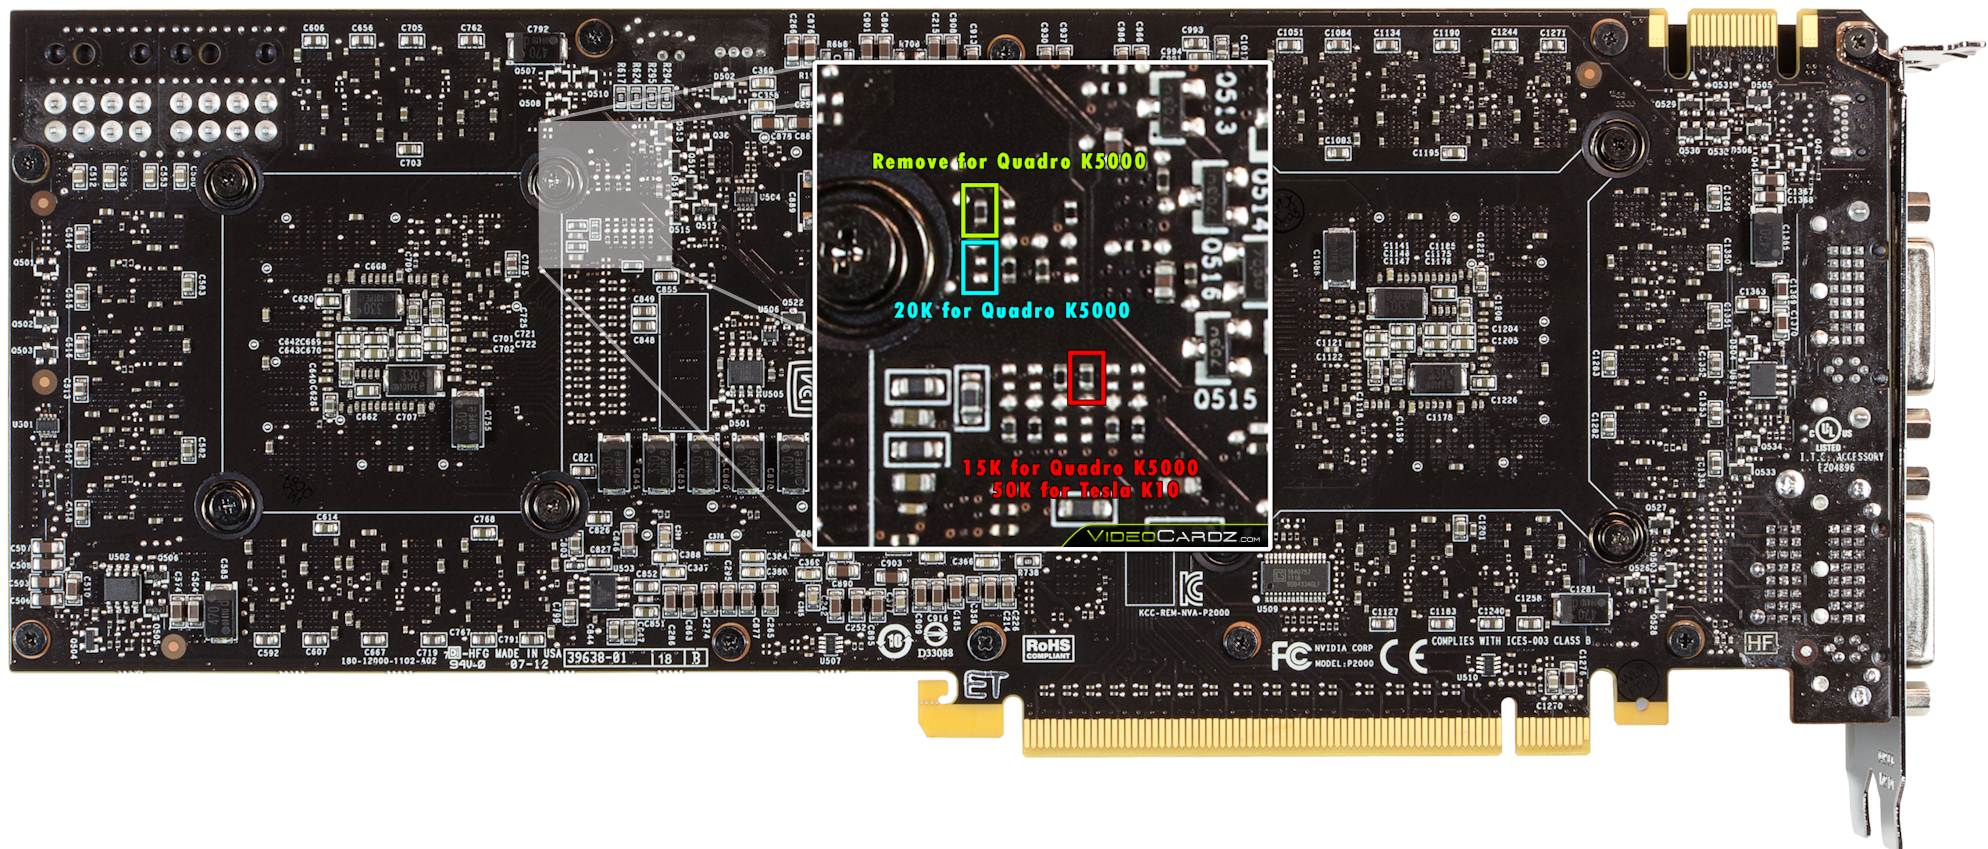 NVIDIA GeForce GTX 690 Modified Into Quadro K5000 and Tesla